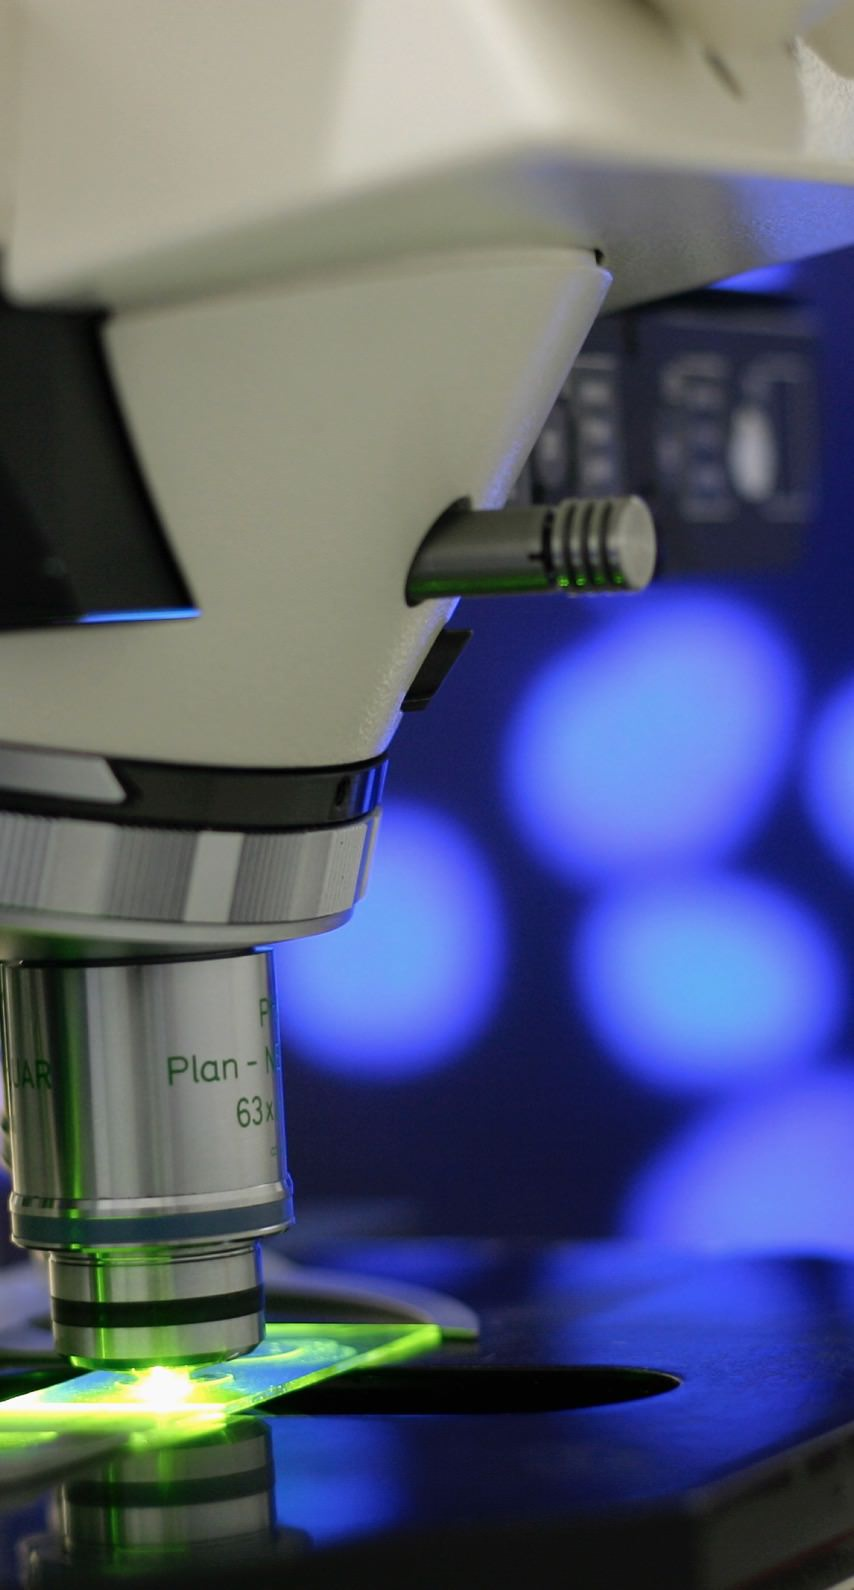 Microscope blue | wallpaper sc iPhone8